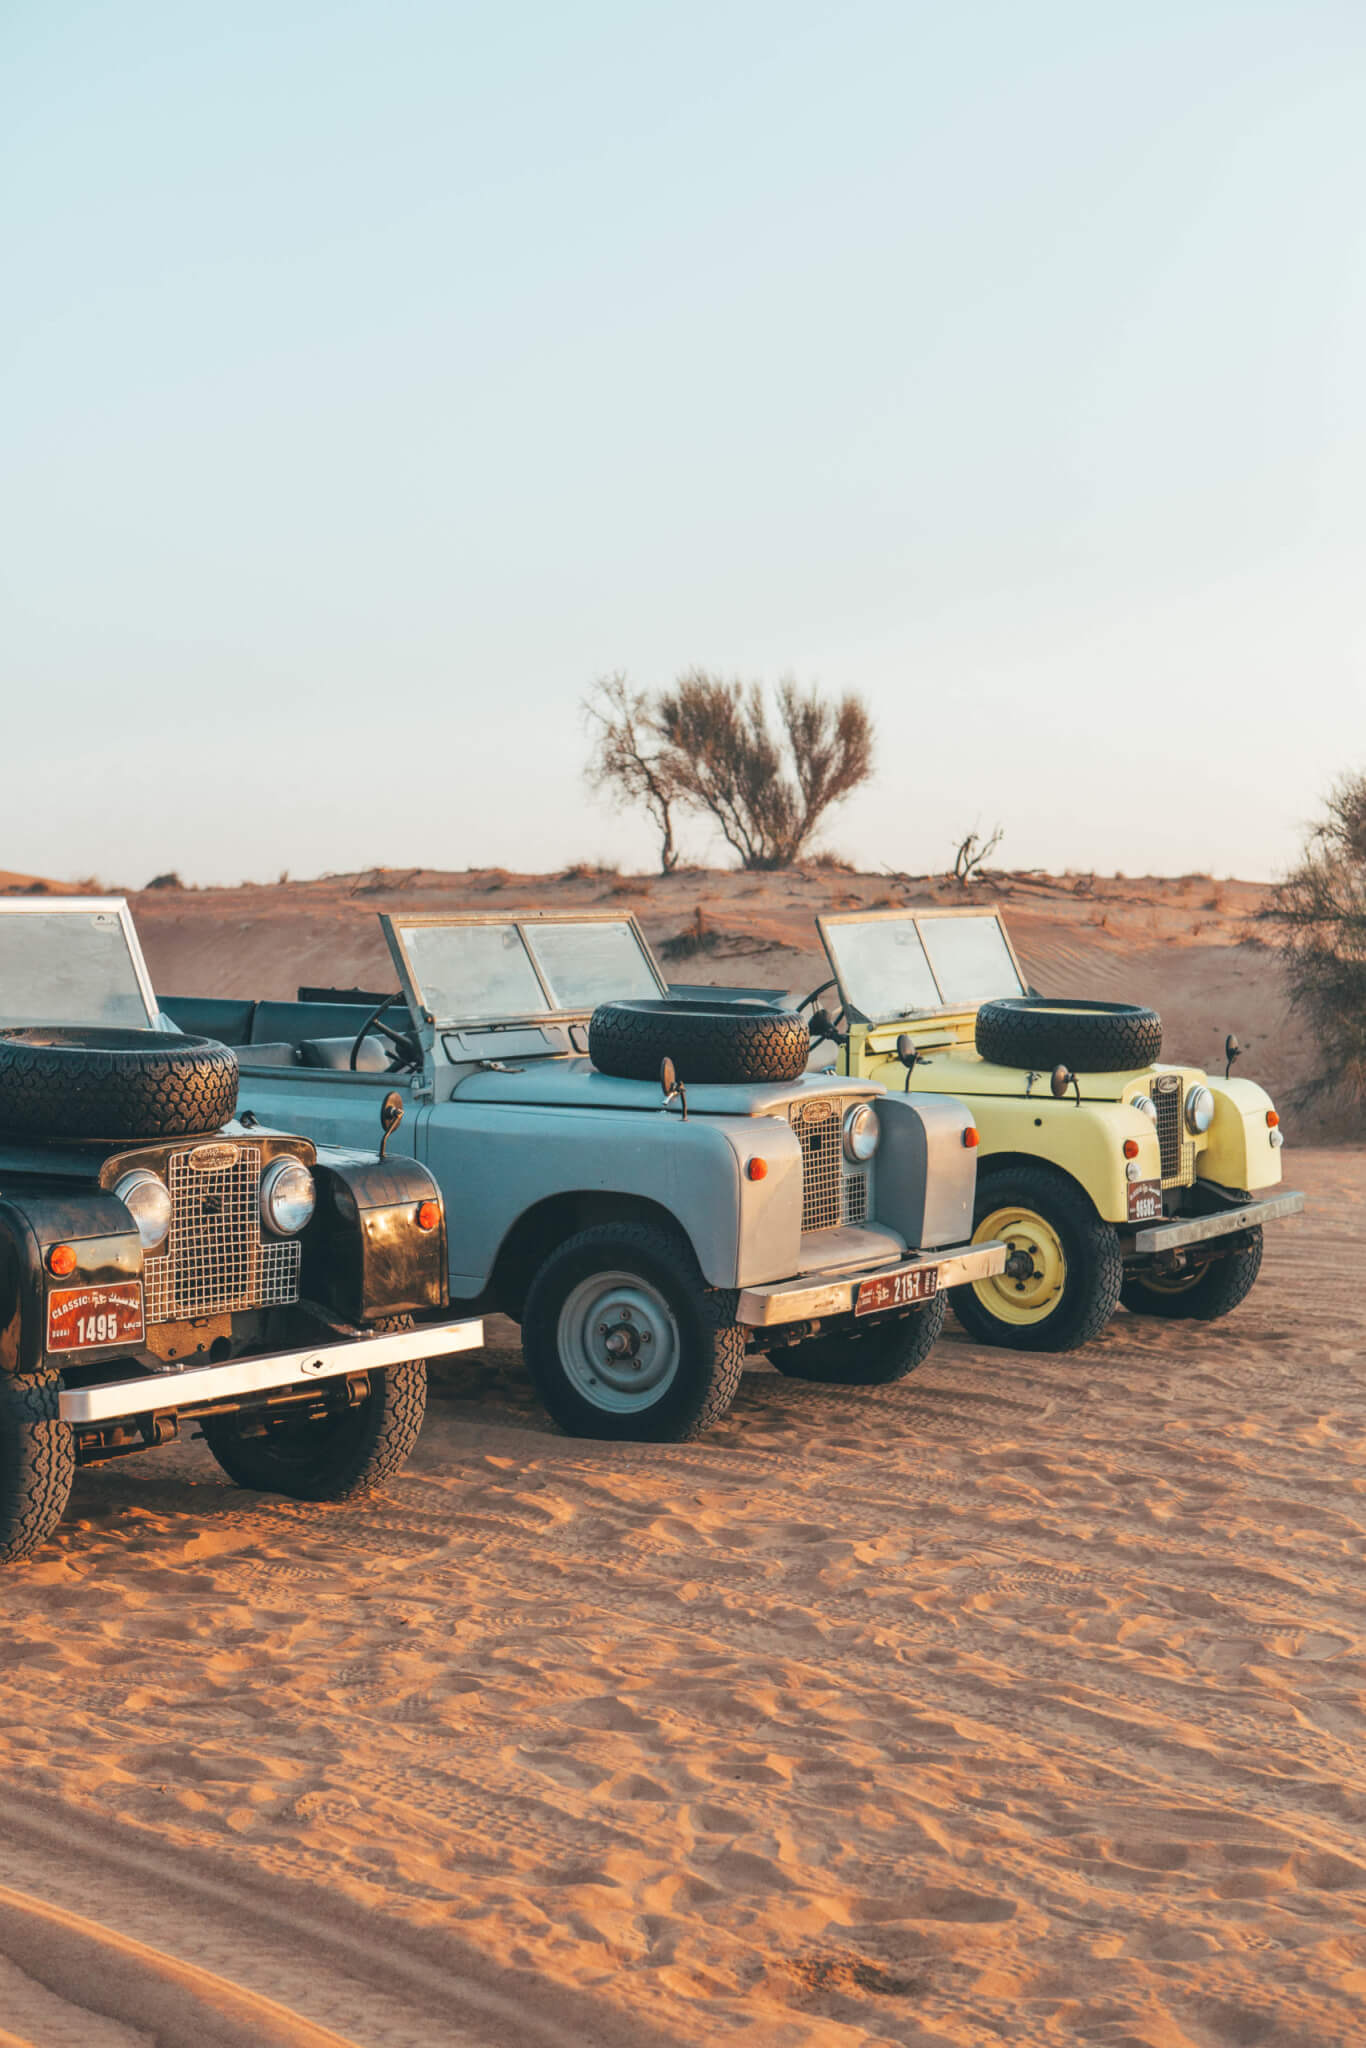 5 best things to do in Dubai 2020 - Platinum Heritage Dubai Desert Safari